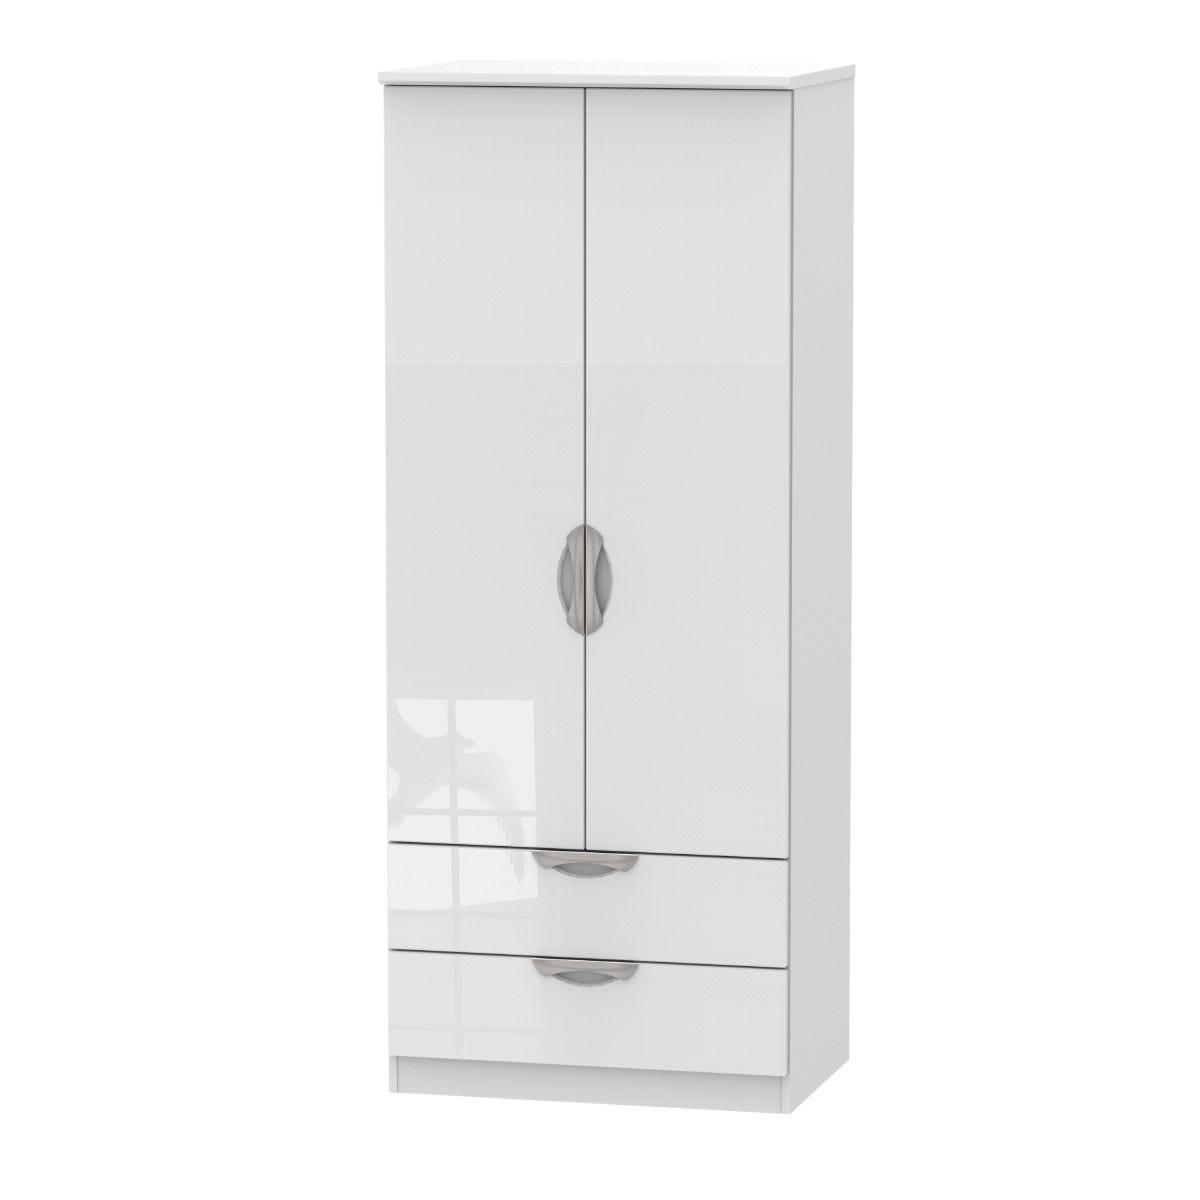 Indices 2 Drawer Robe Dresser - White